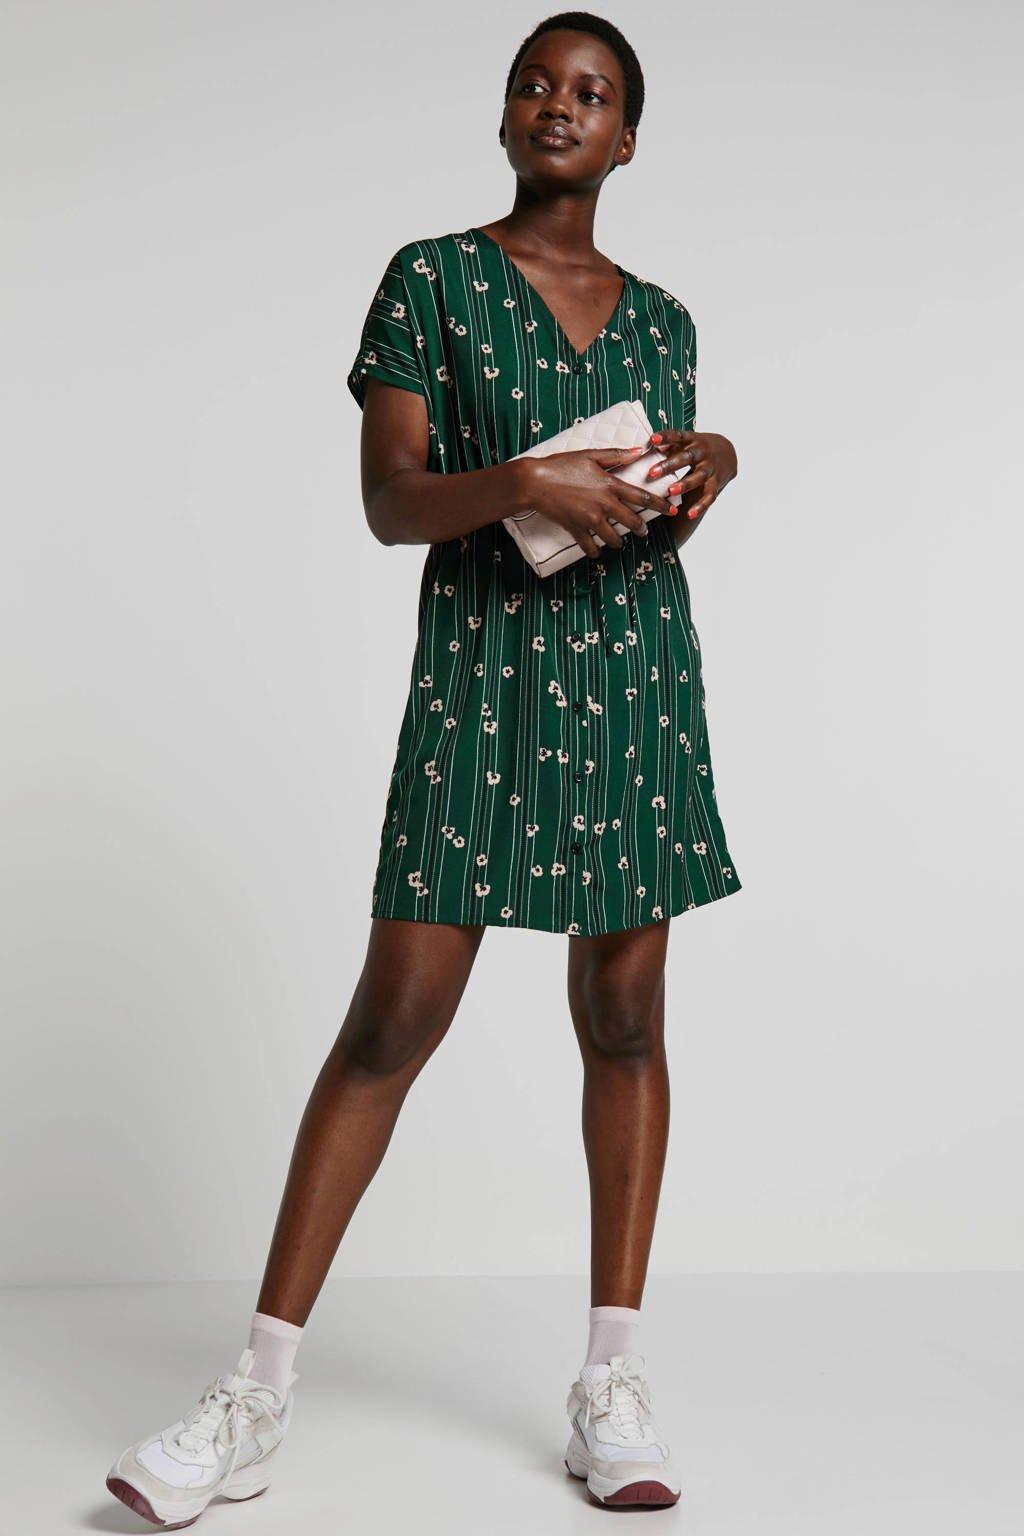 VERO MODA blousejurk met all over print groen, groen multi